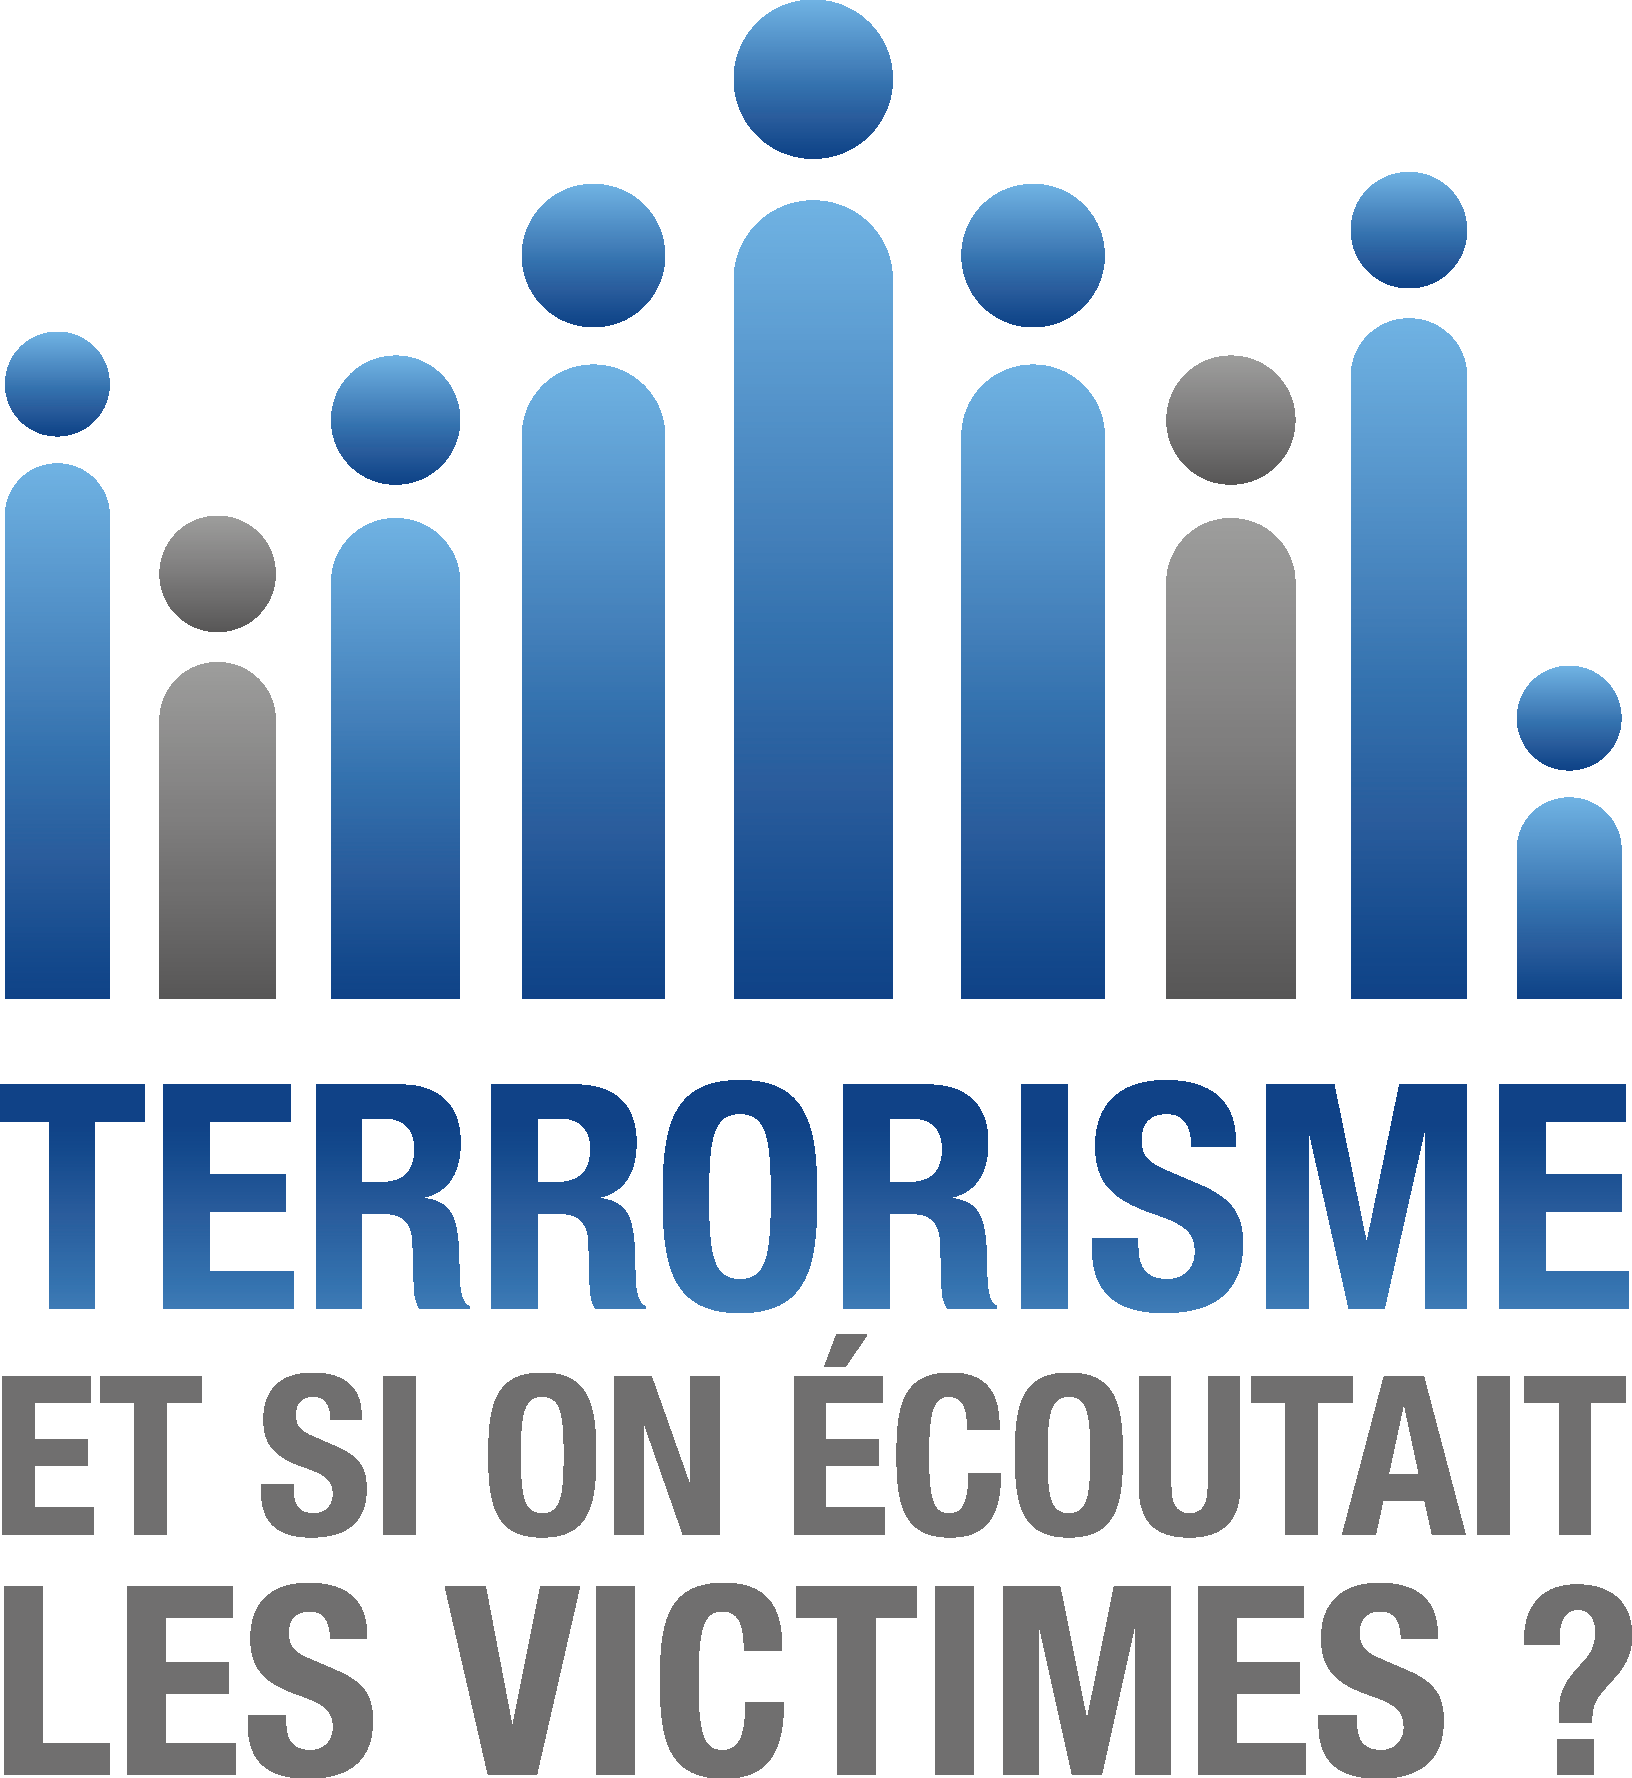 Terrorisme_ecoute_victimes_logo.png